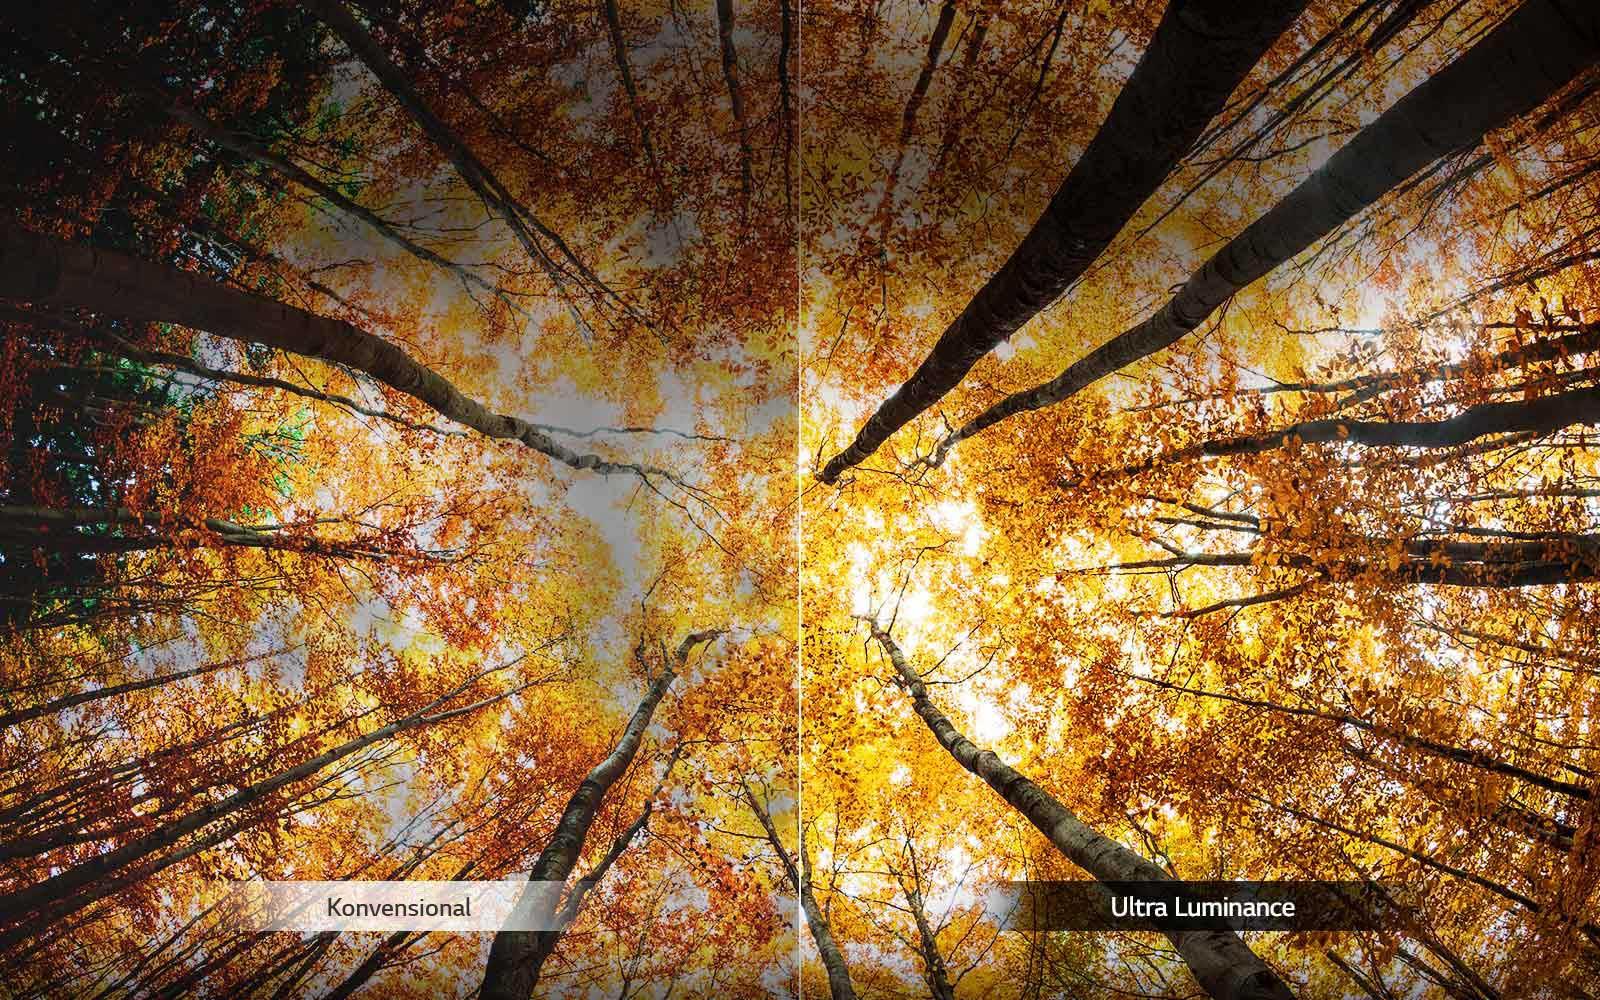 05_Ultra_Luminance_desktop_V2